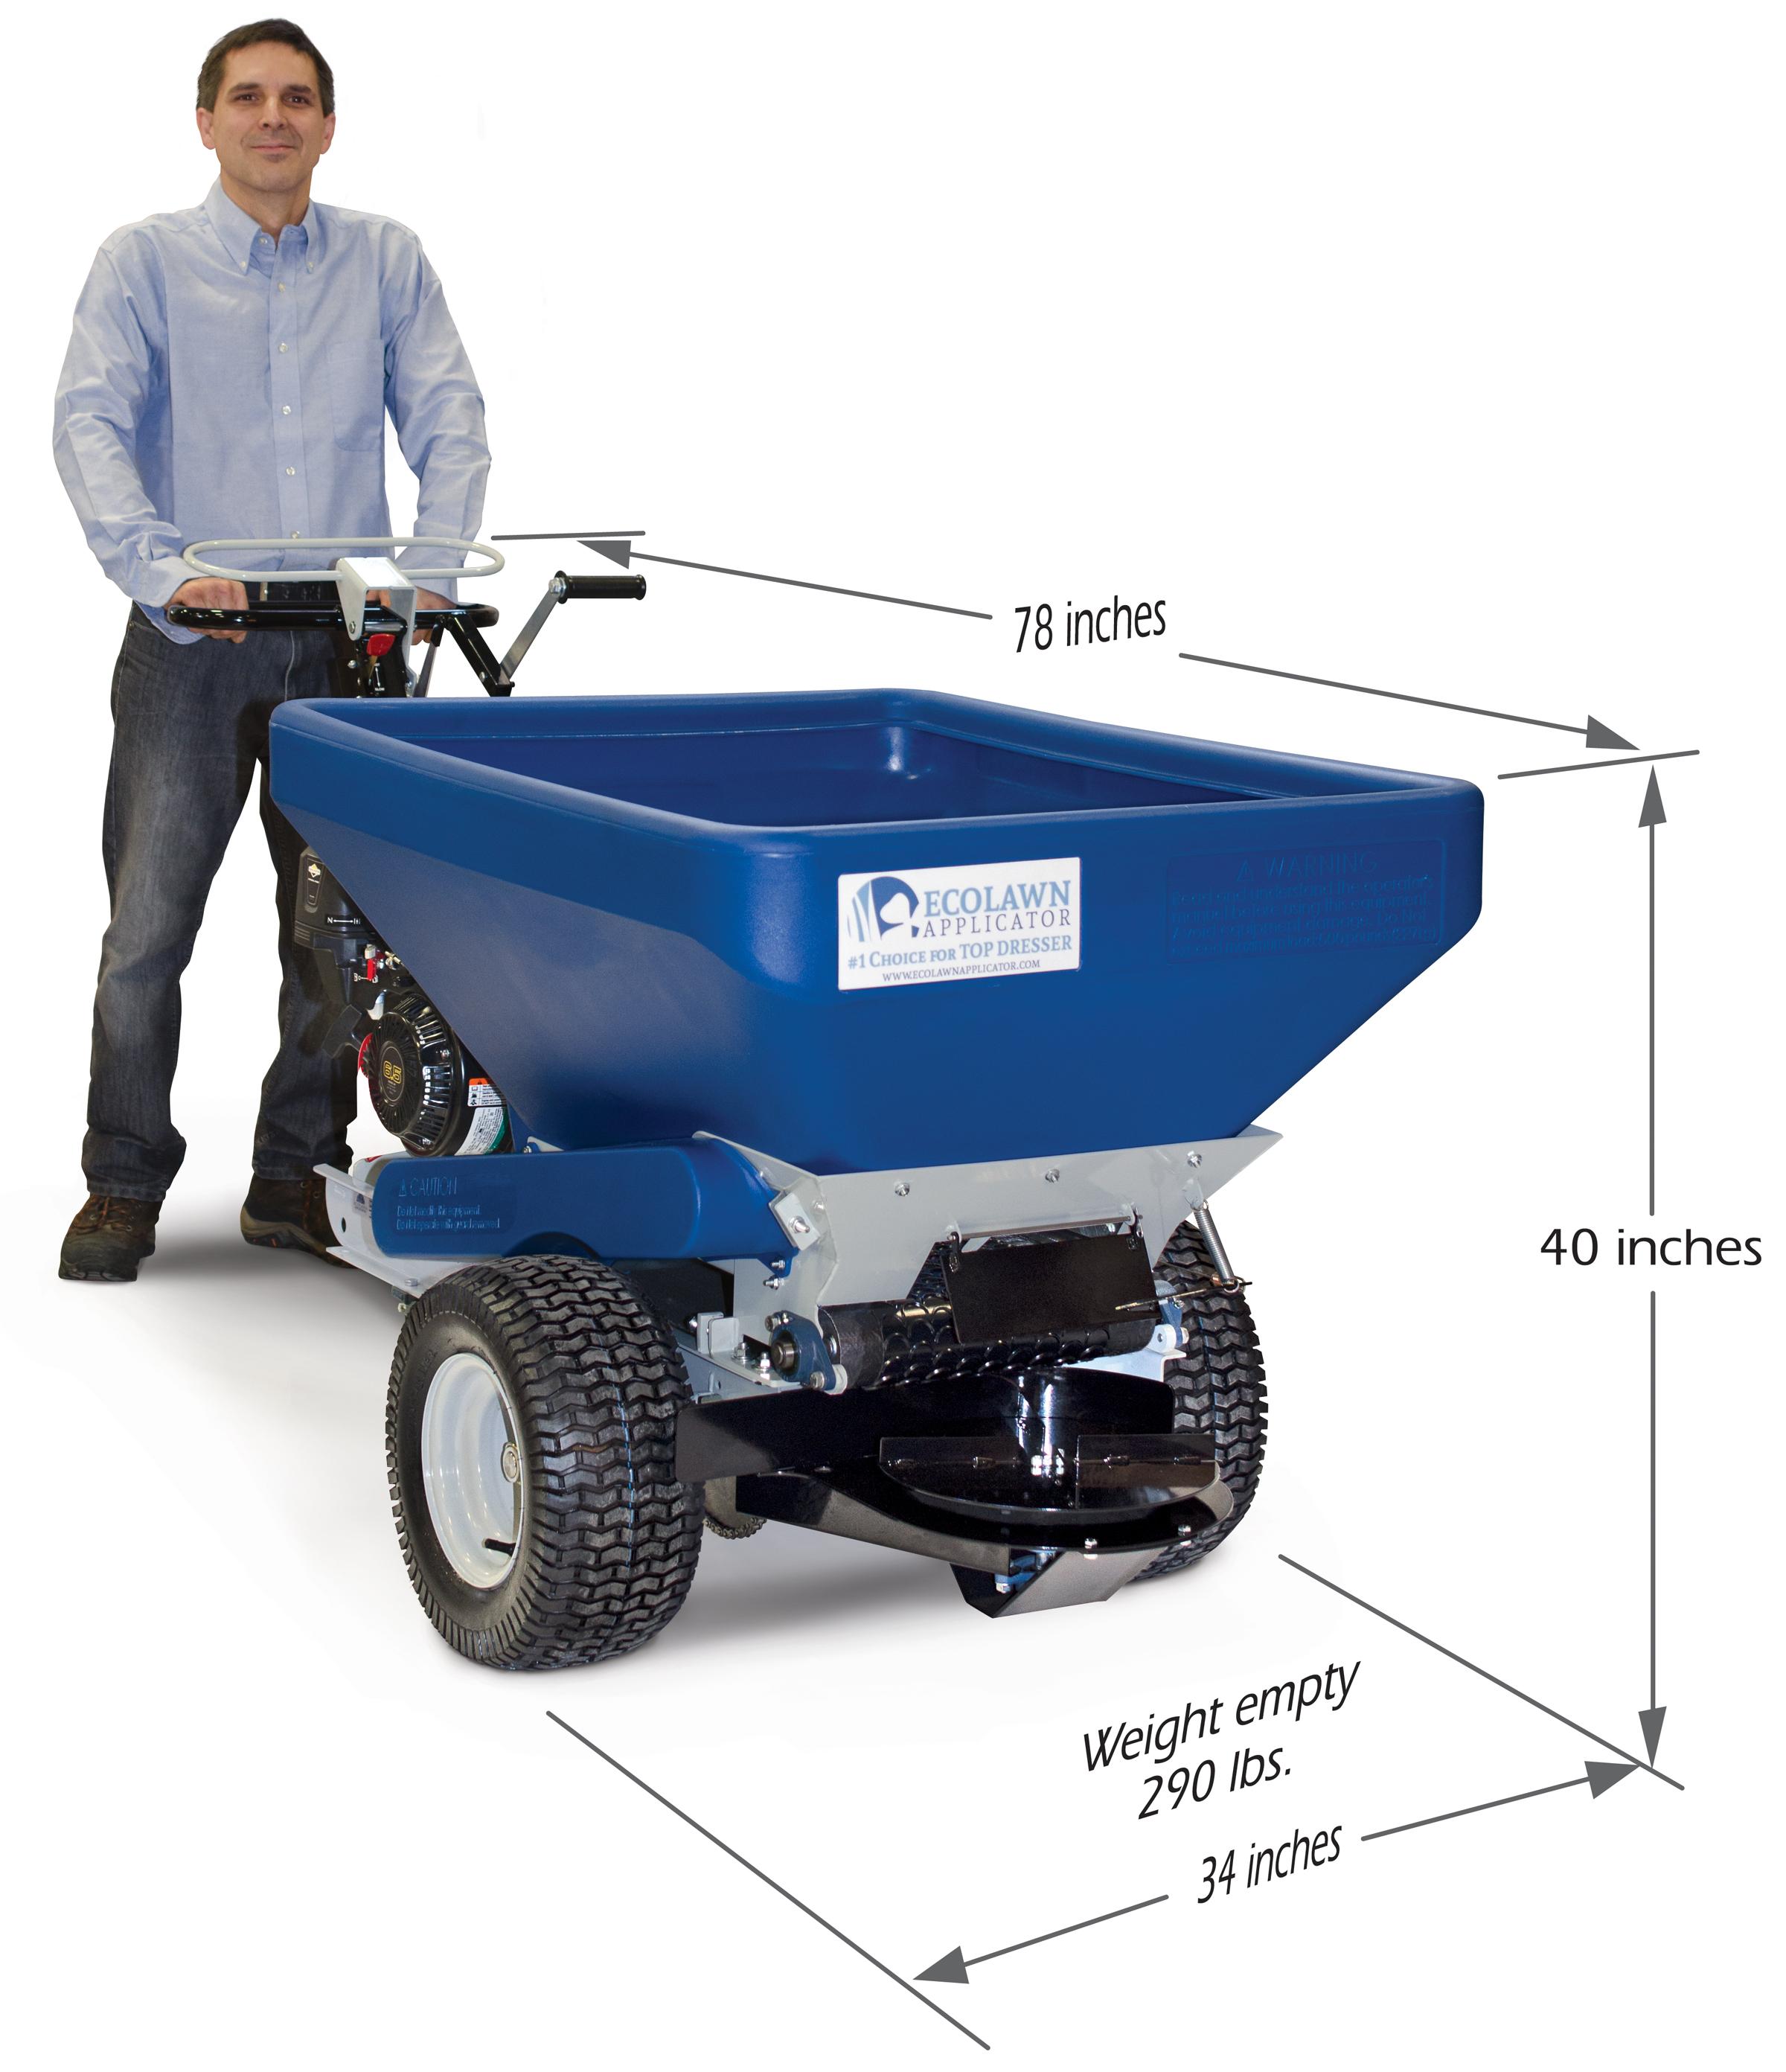 Eco 150 Ecolawn Applicator